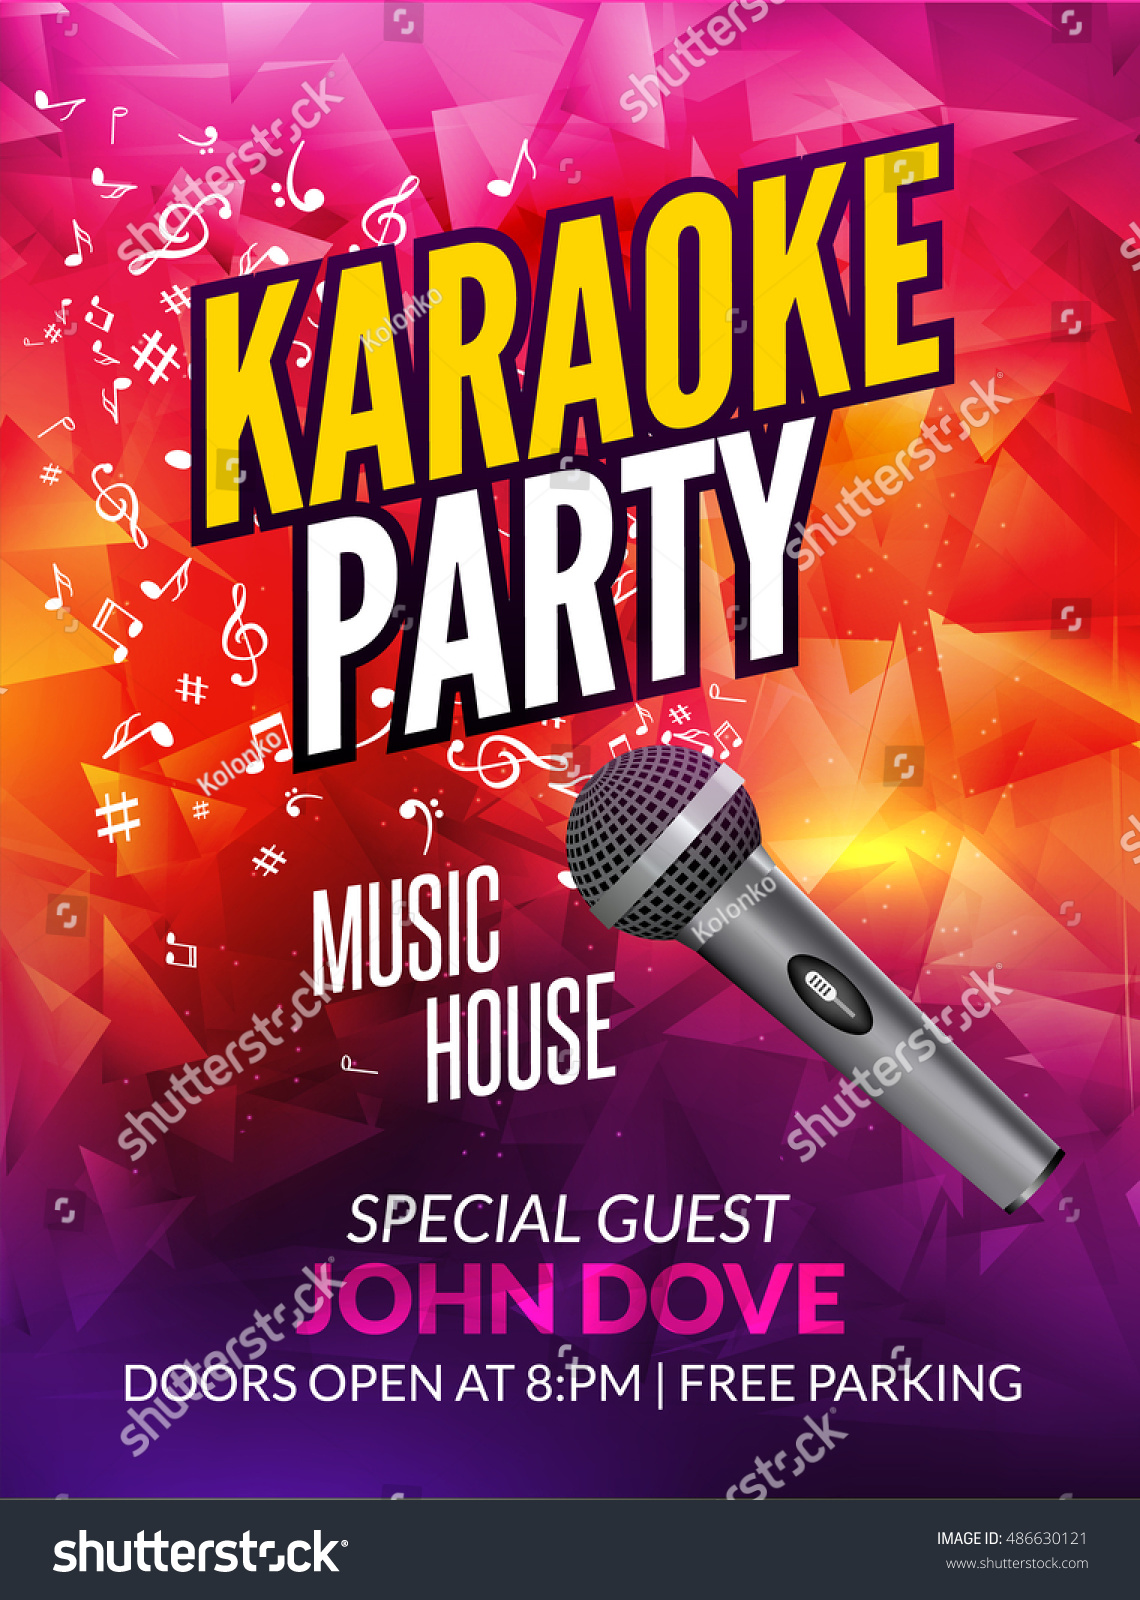 karaoke party invitation poster design template stock